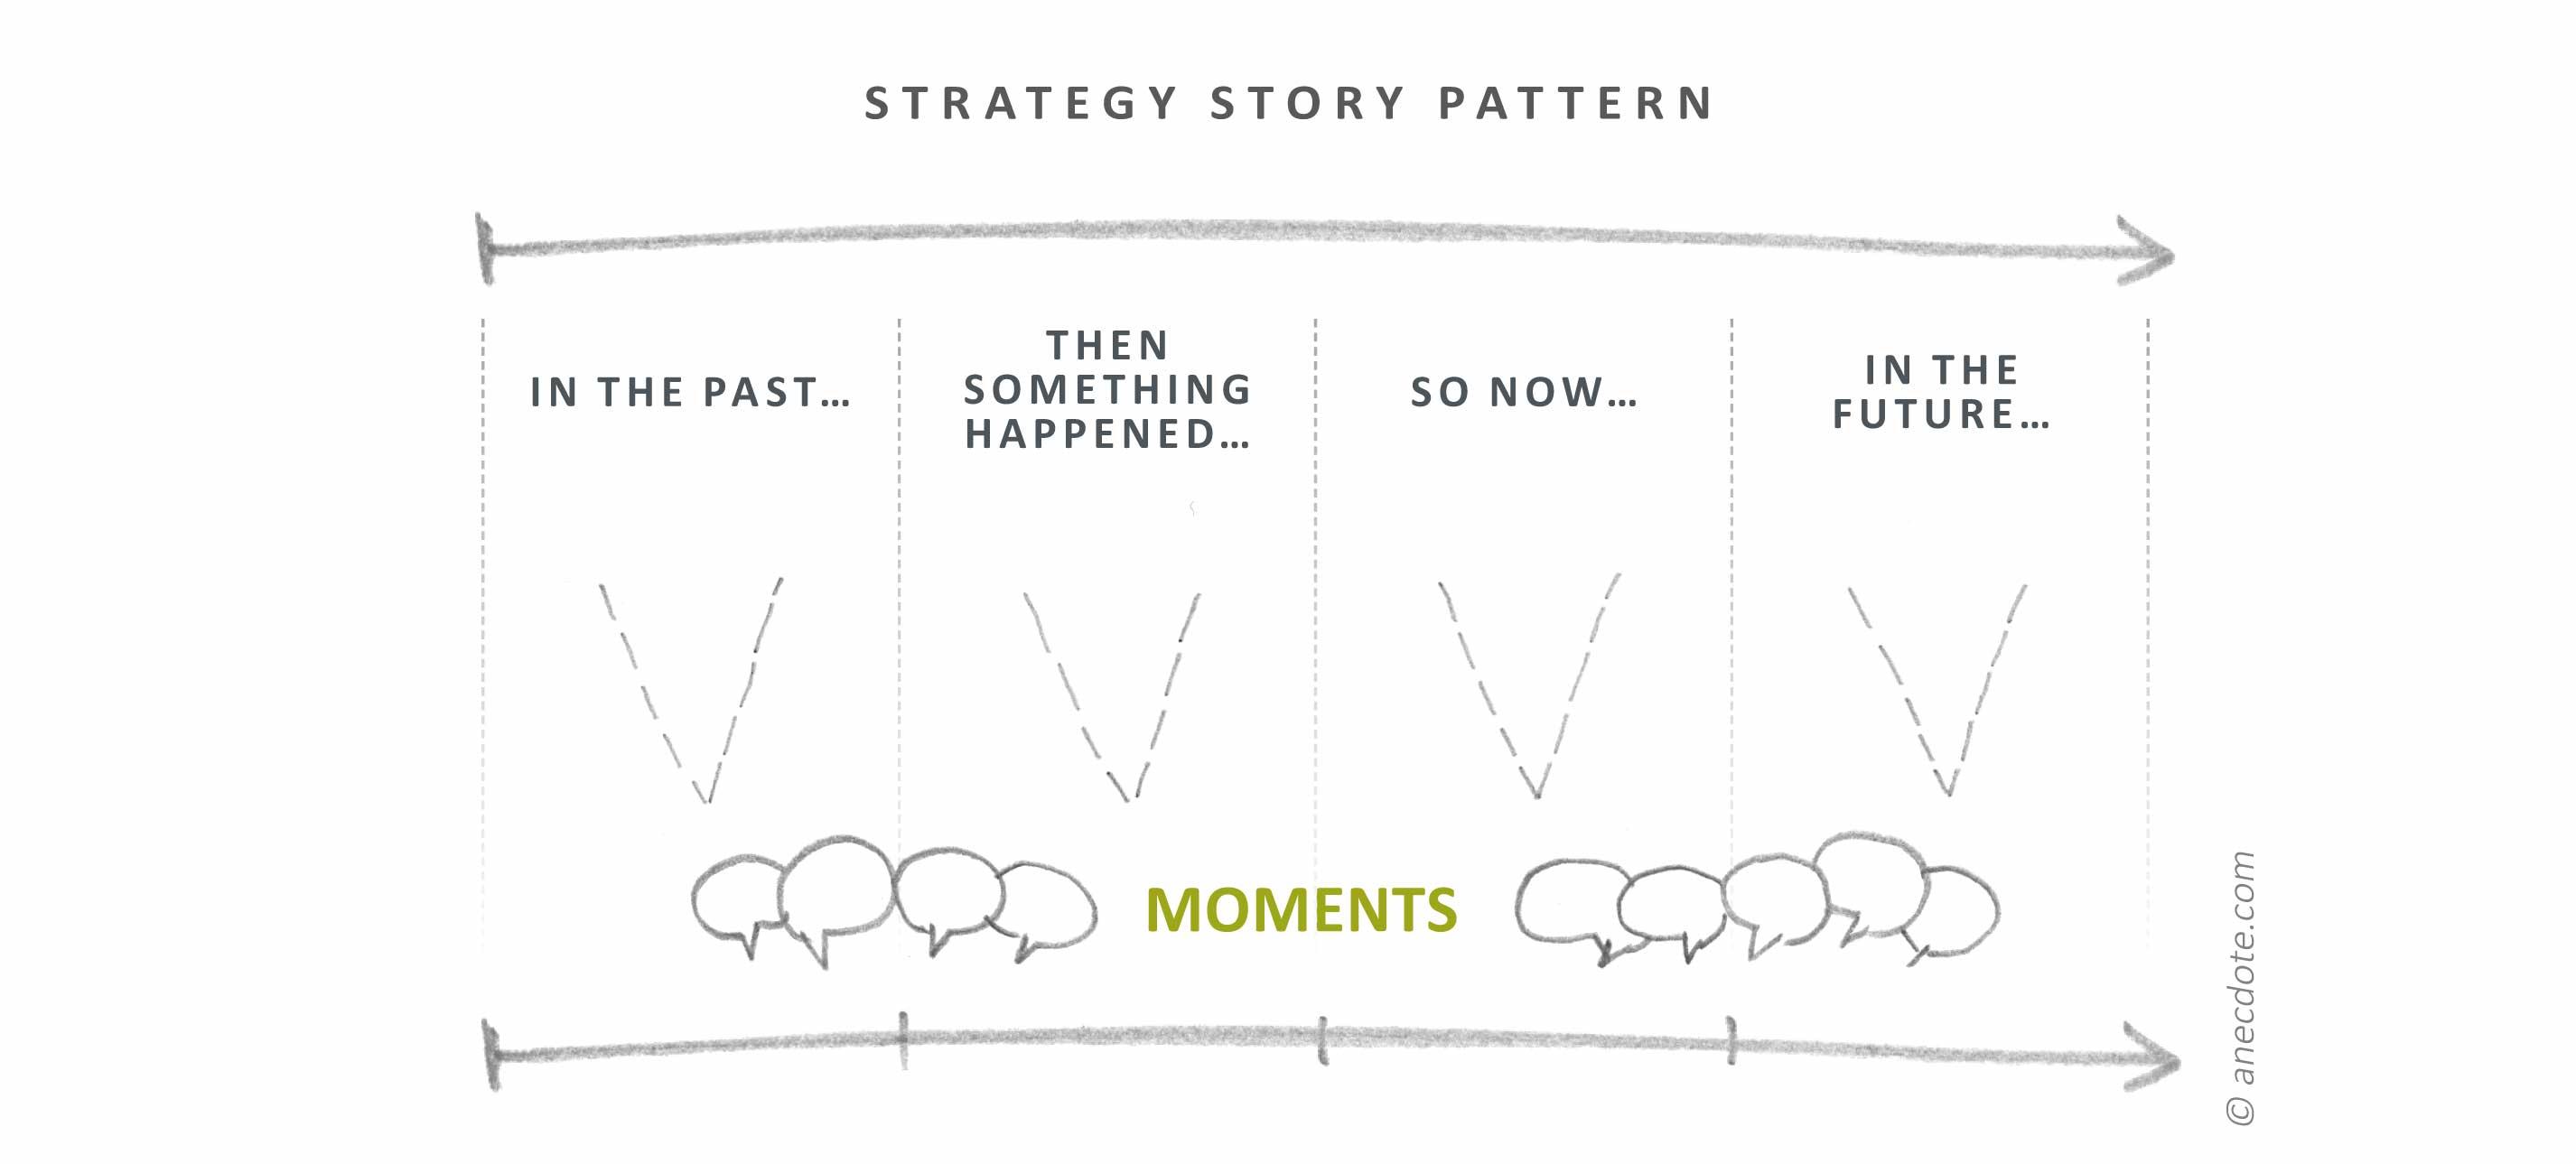 Strategy story pattern